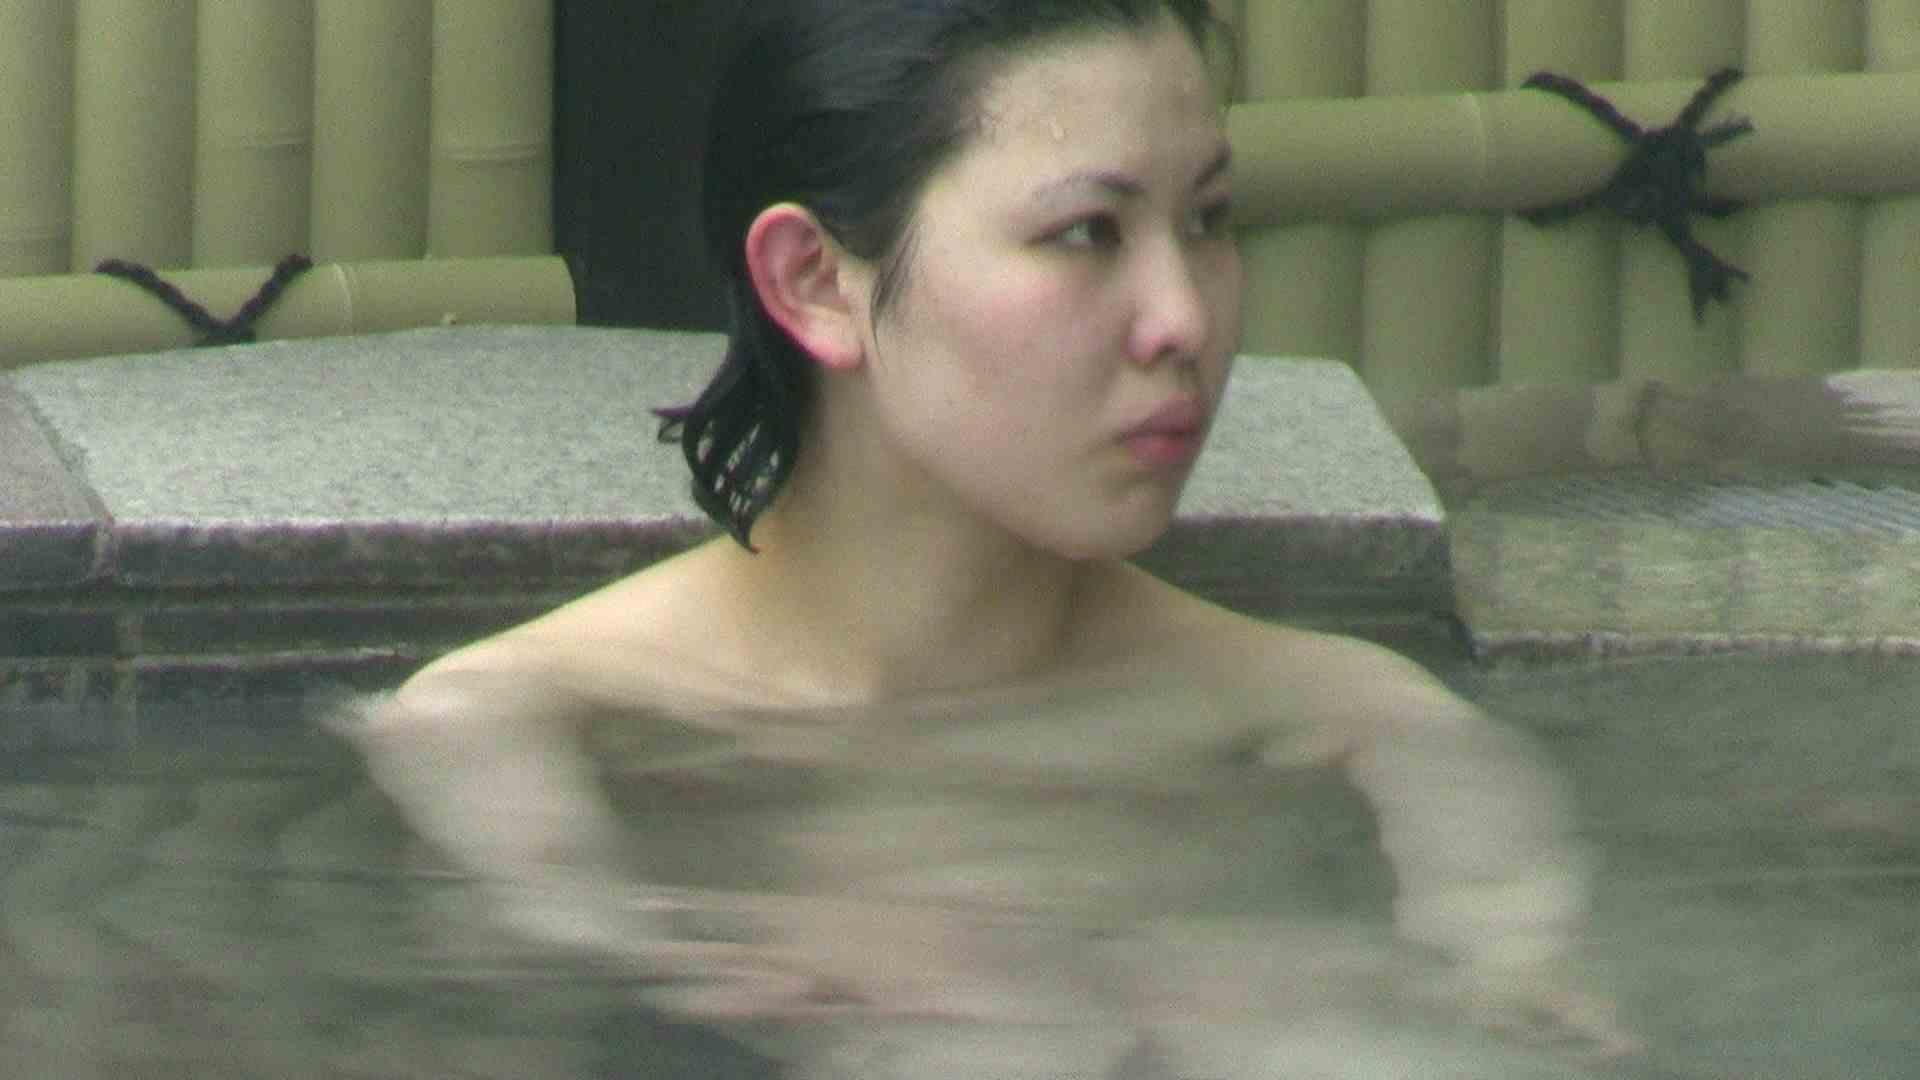 Aquaな露天風呂Vol.114 盗撮映像  72Pix 51